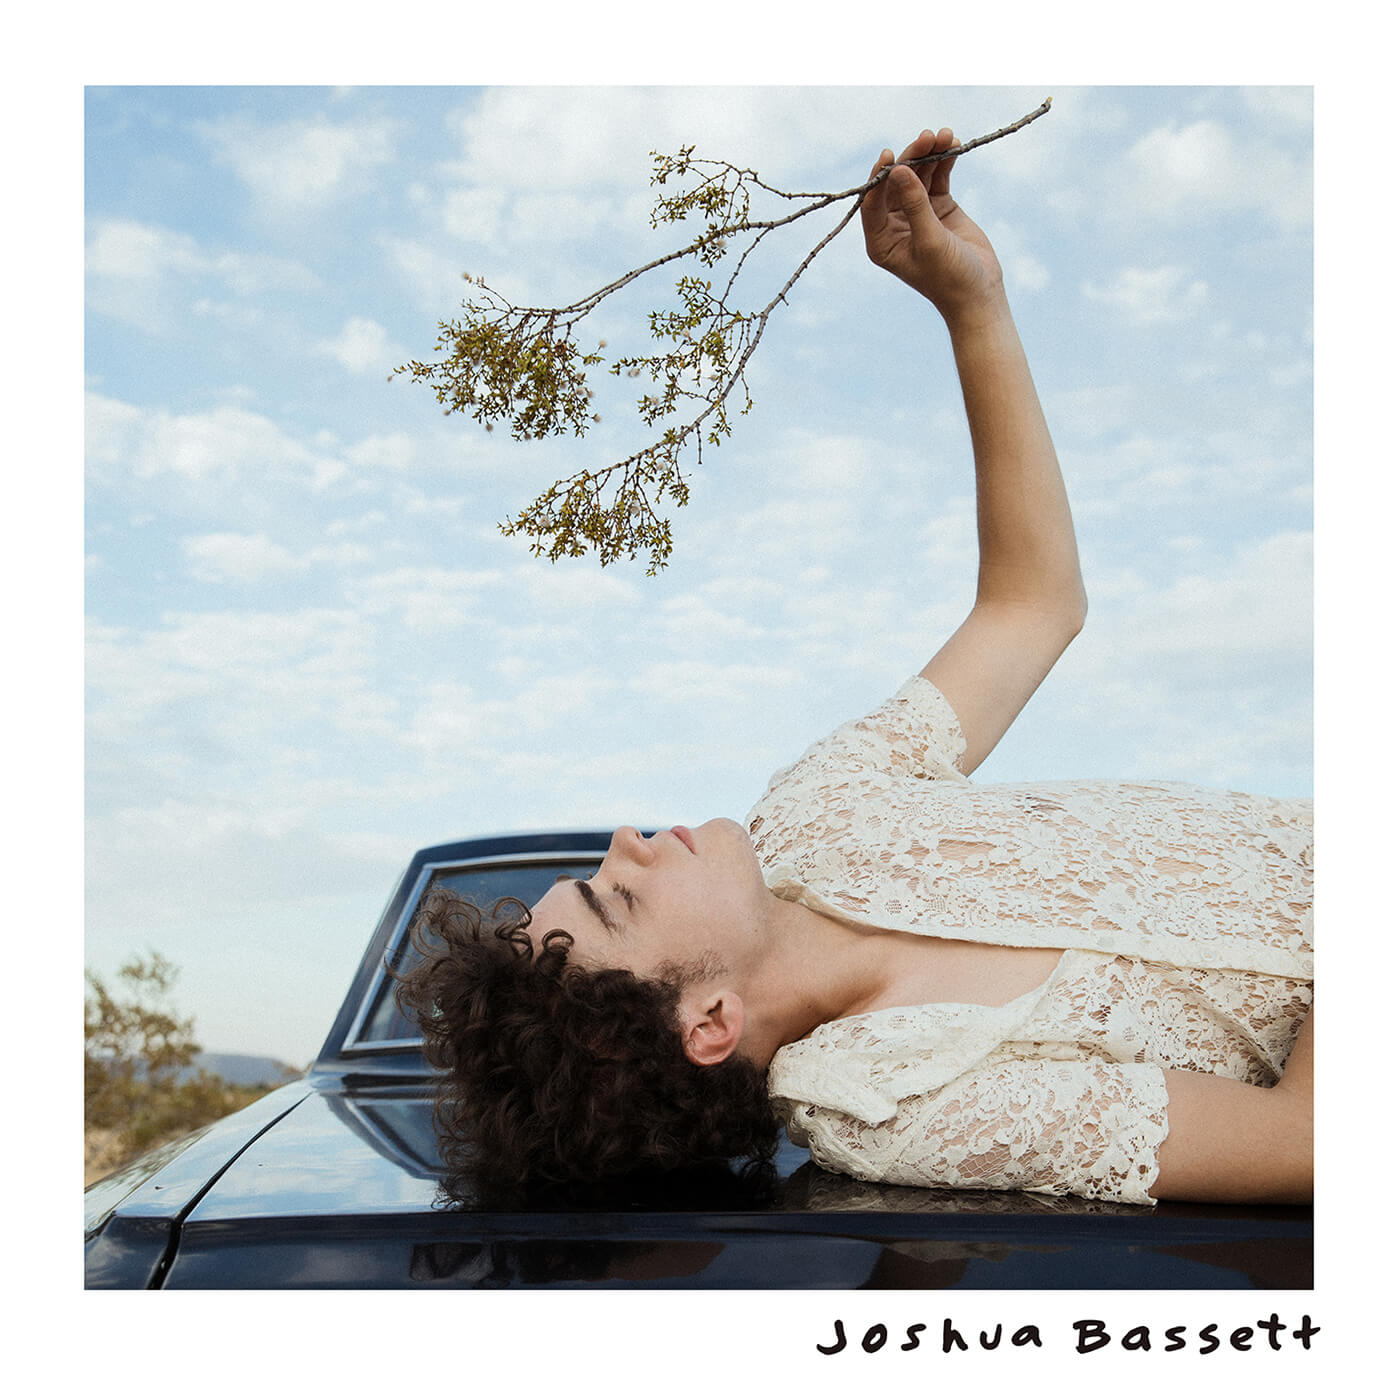 Joshua Bassett - Self-Titled EP